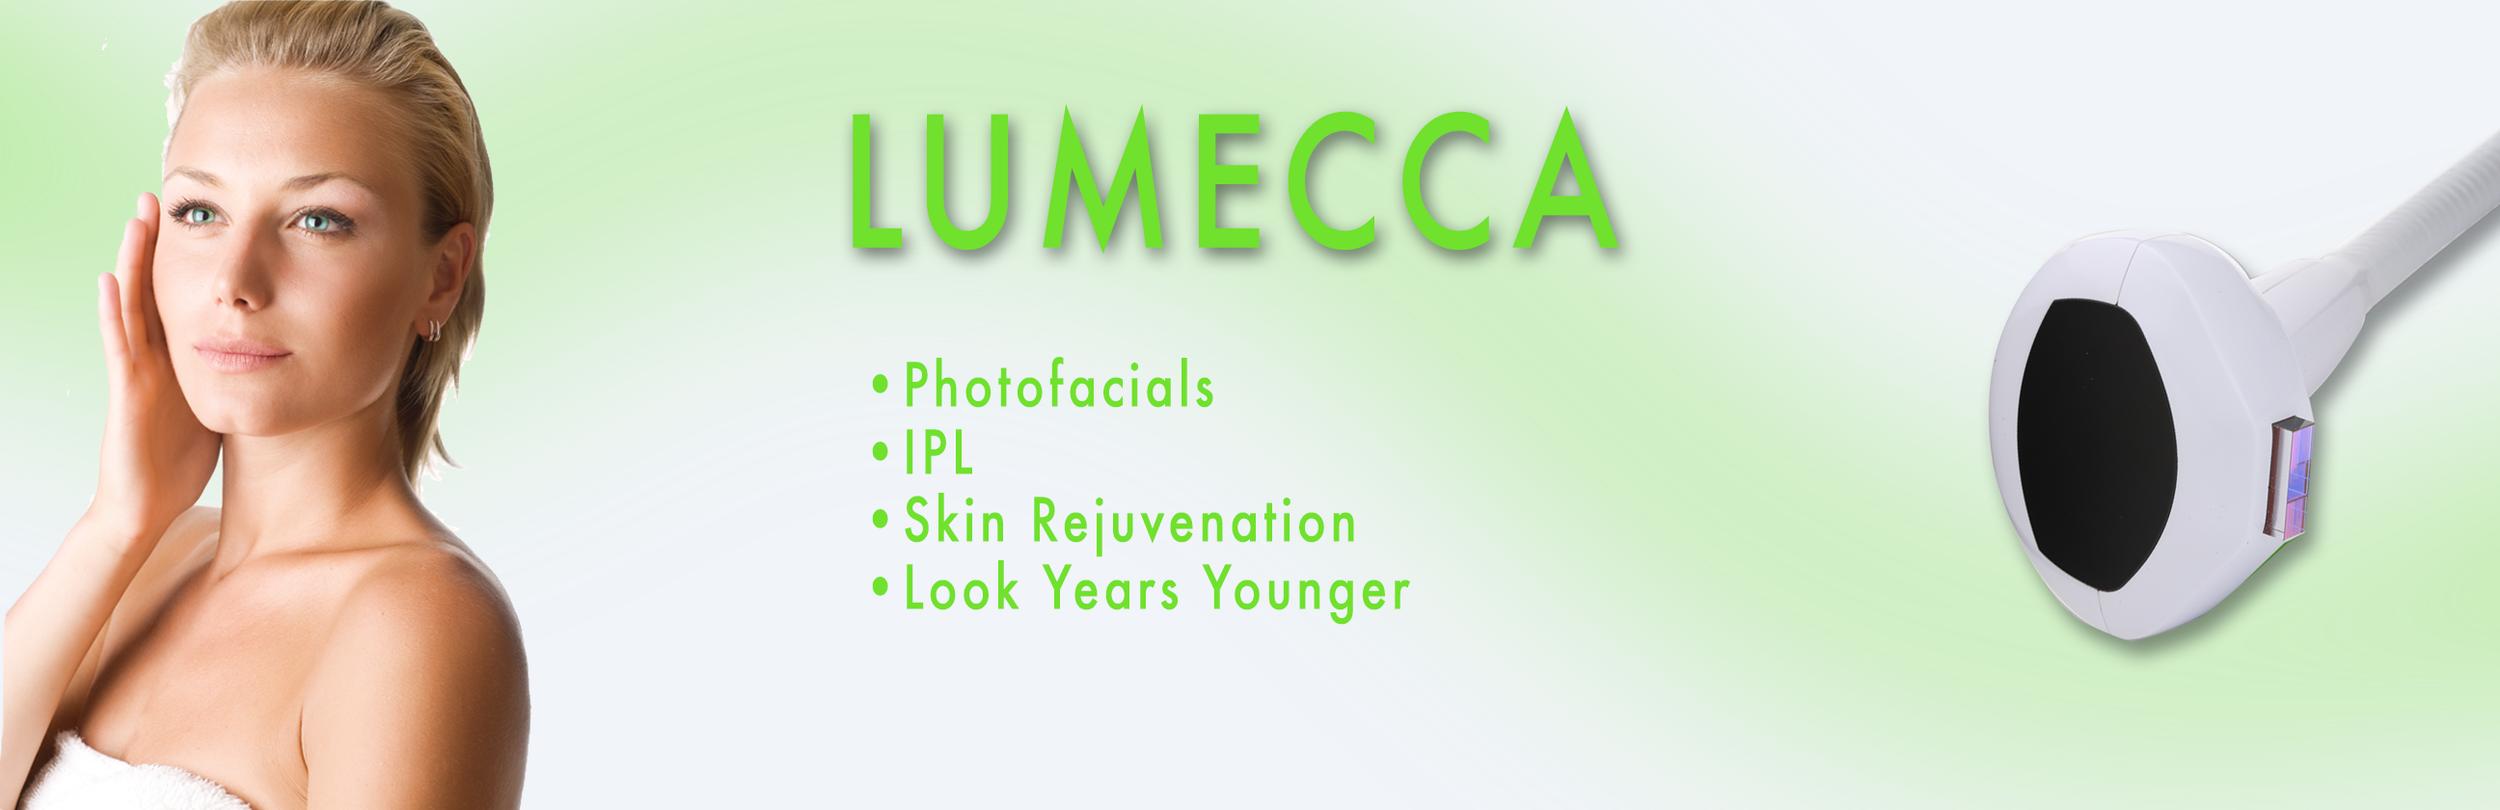 Lumecca-Banner-Edit.png